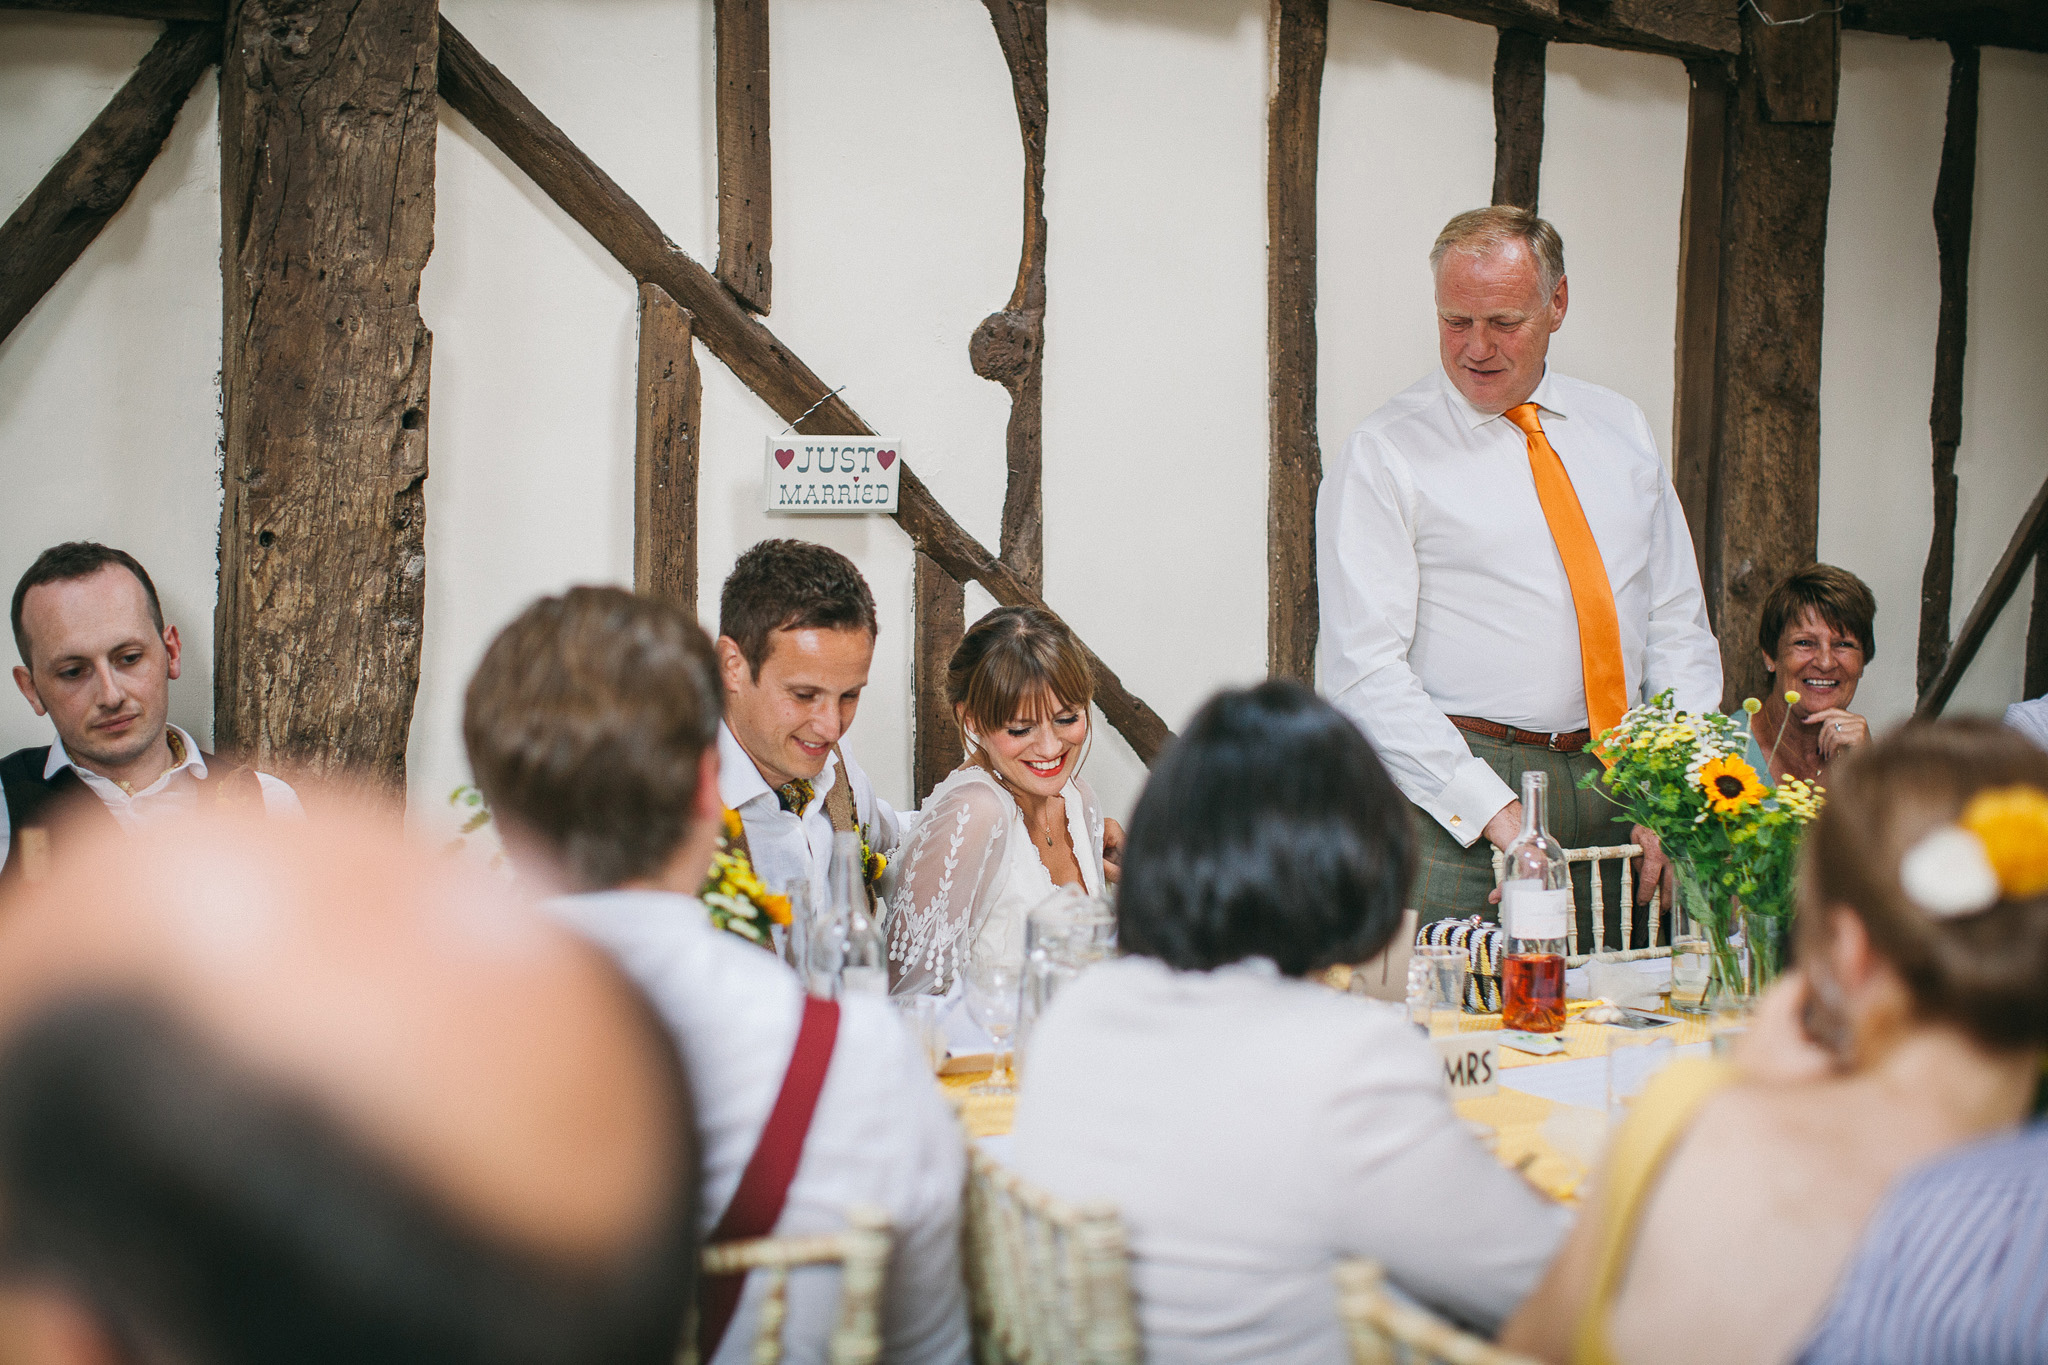 chantry_sussex_barn_wedding_344.jpg